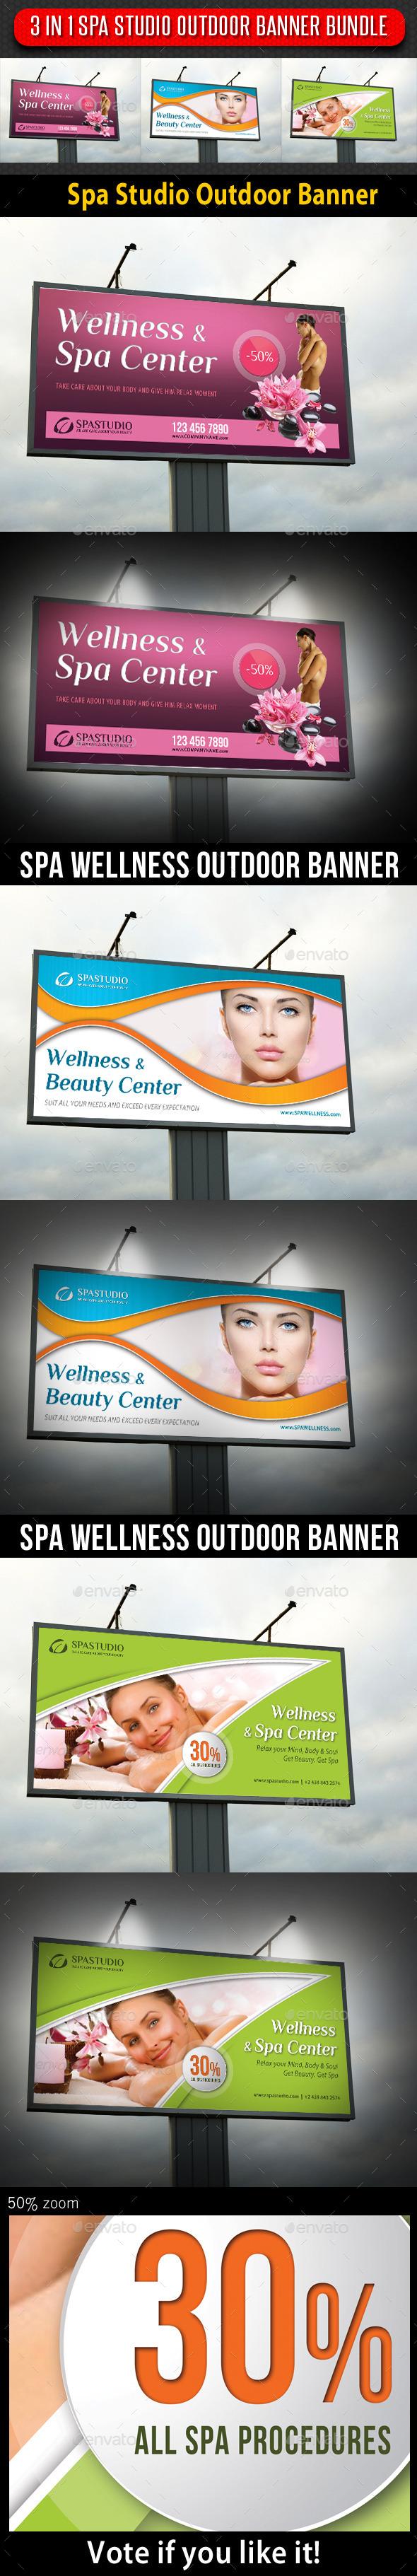 3 in 1 Spa Studio Outdoor Banner Bundle - Signage Print Templates